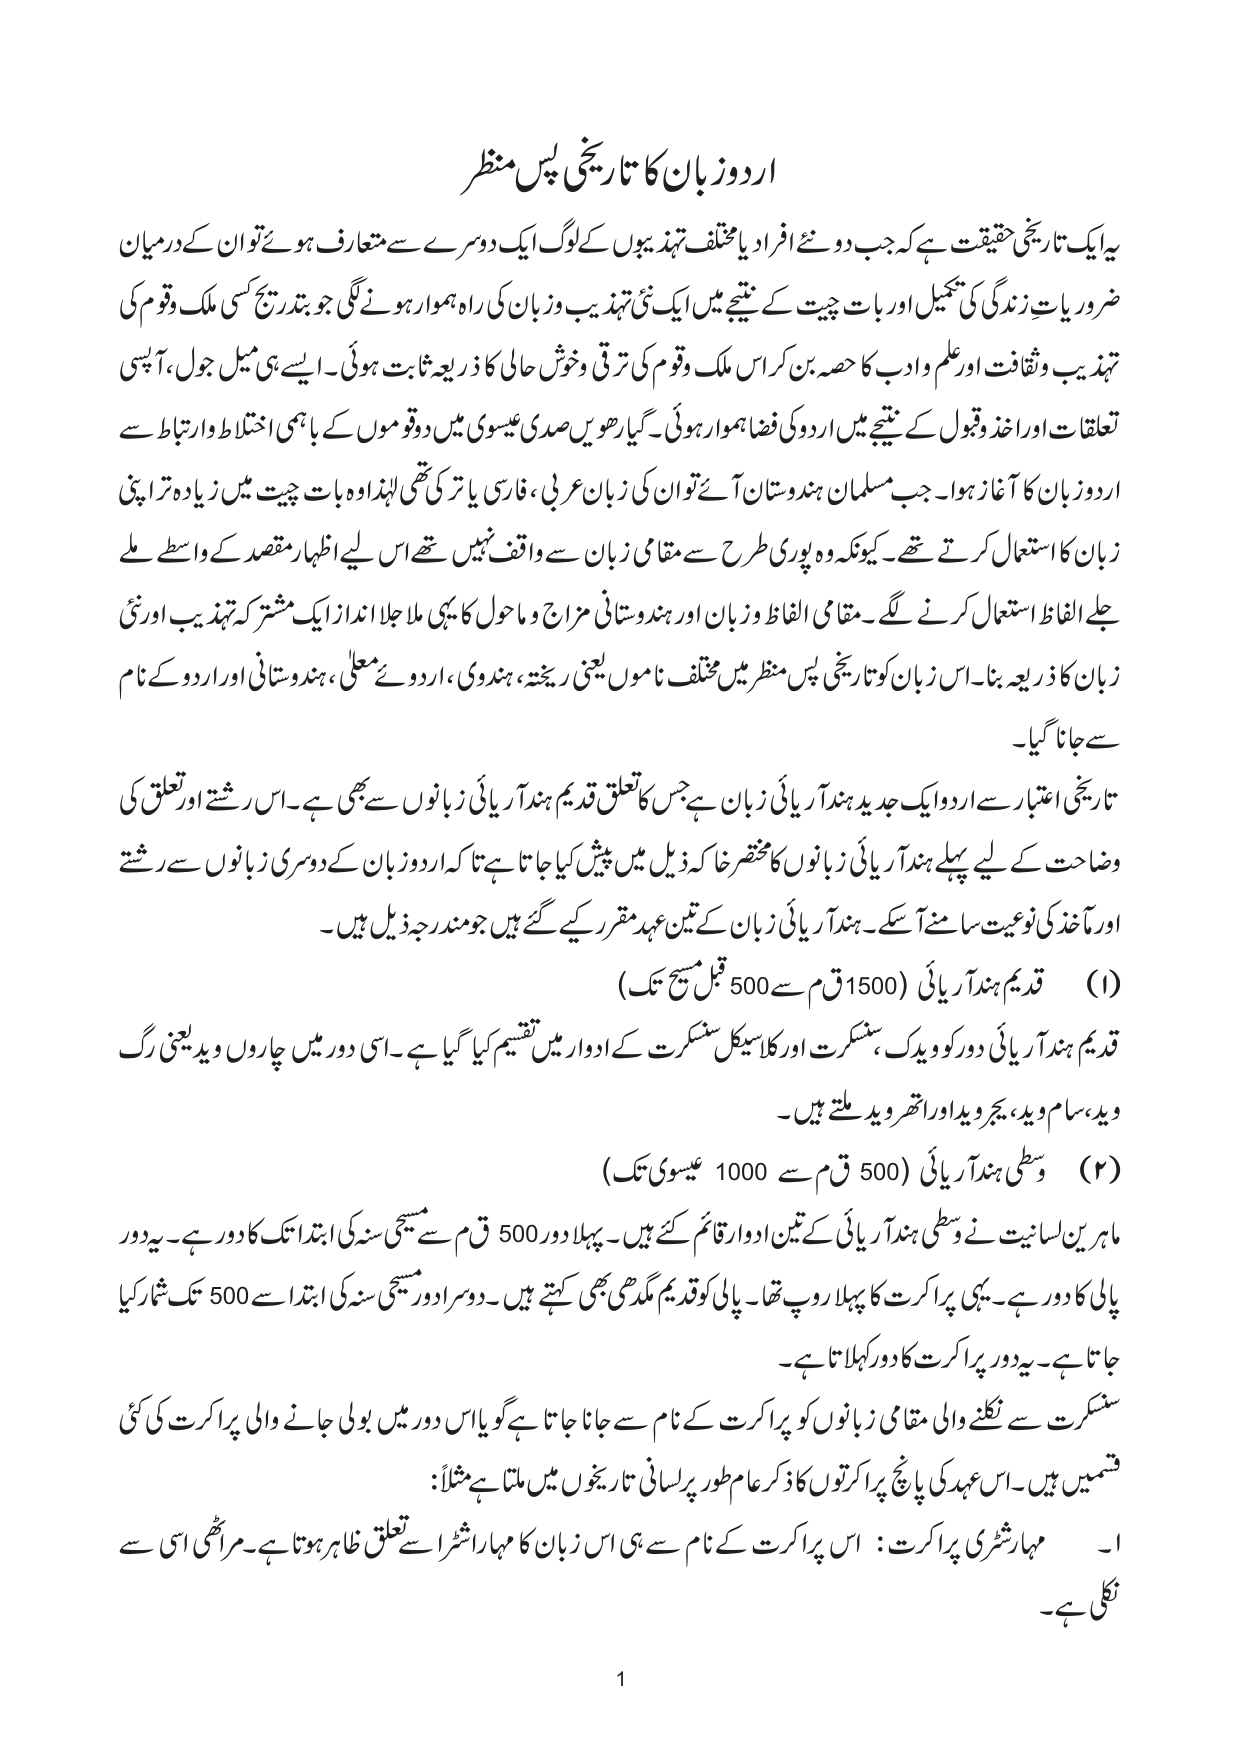 اردو زبان کا تاریخی پس منظر - A short history of the Urdu